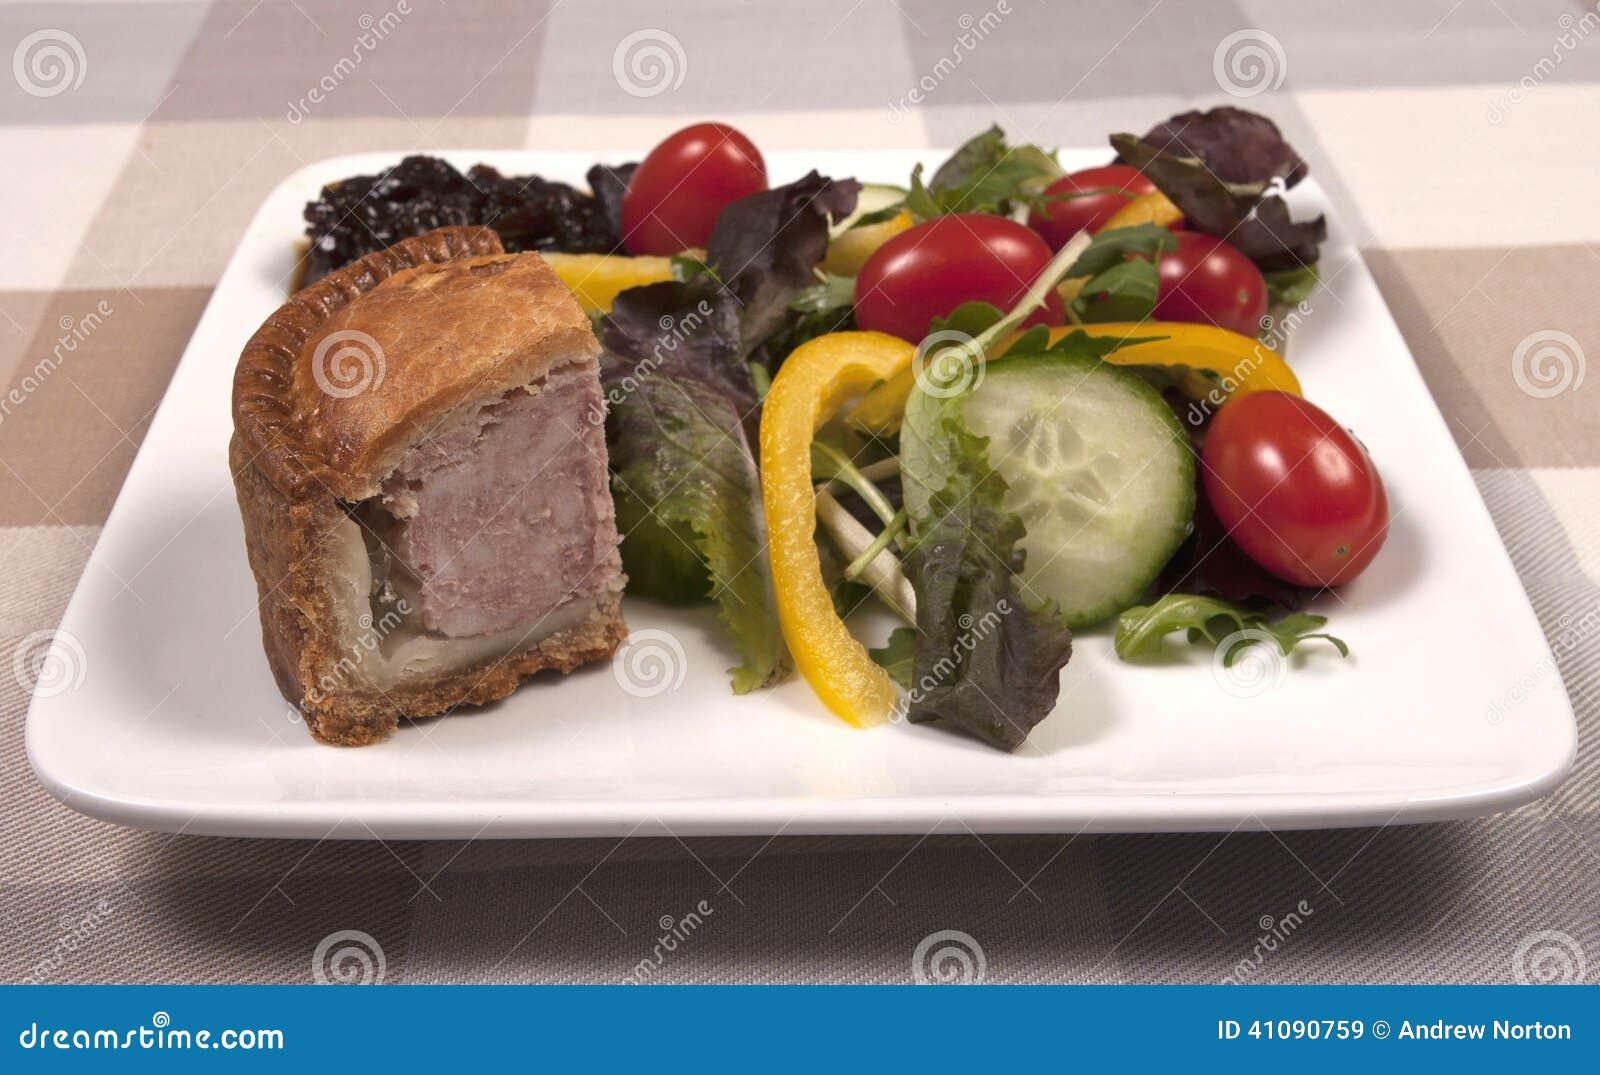 Pork Pie Salad Royalty Free Stock Photography